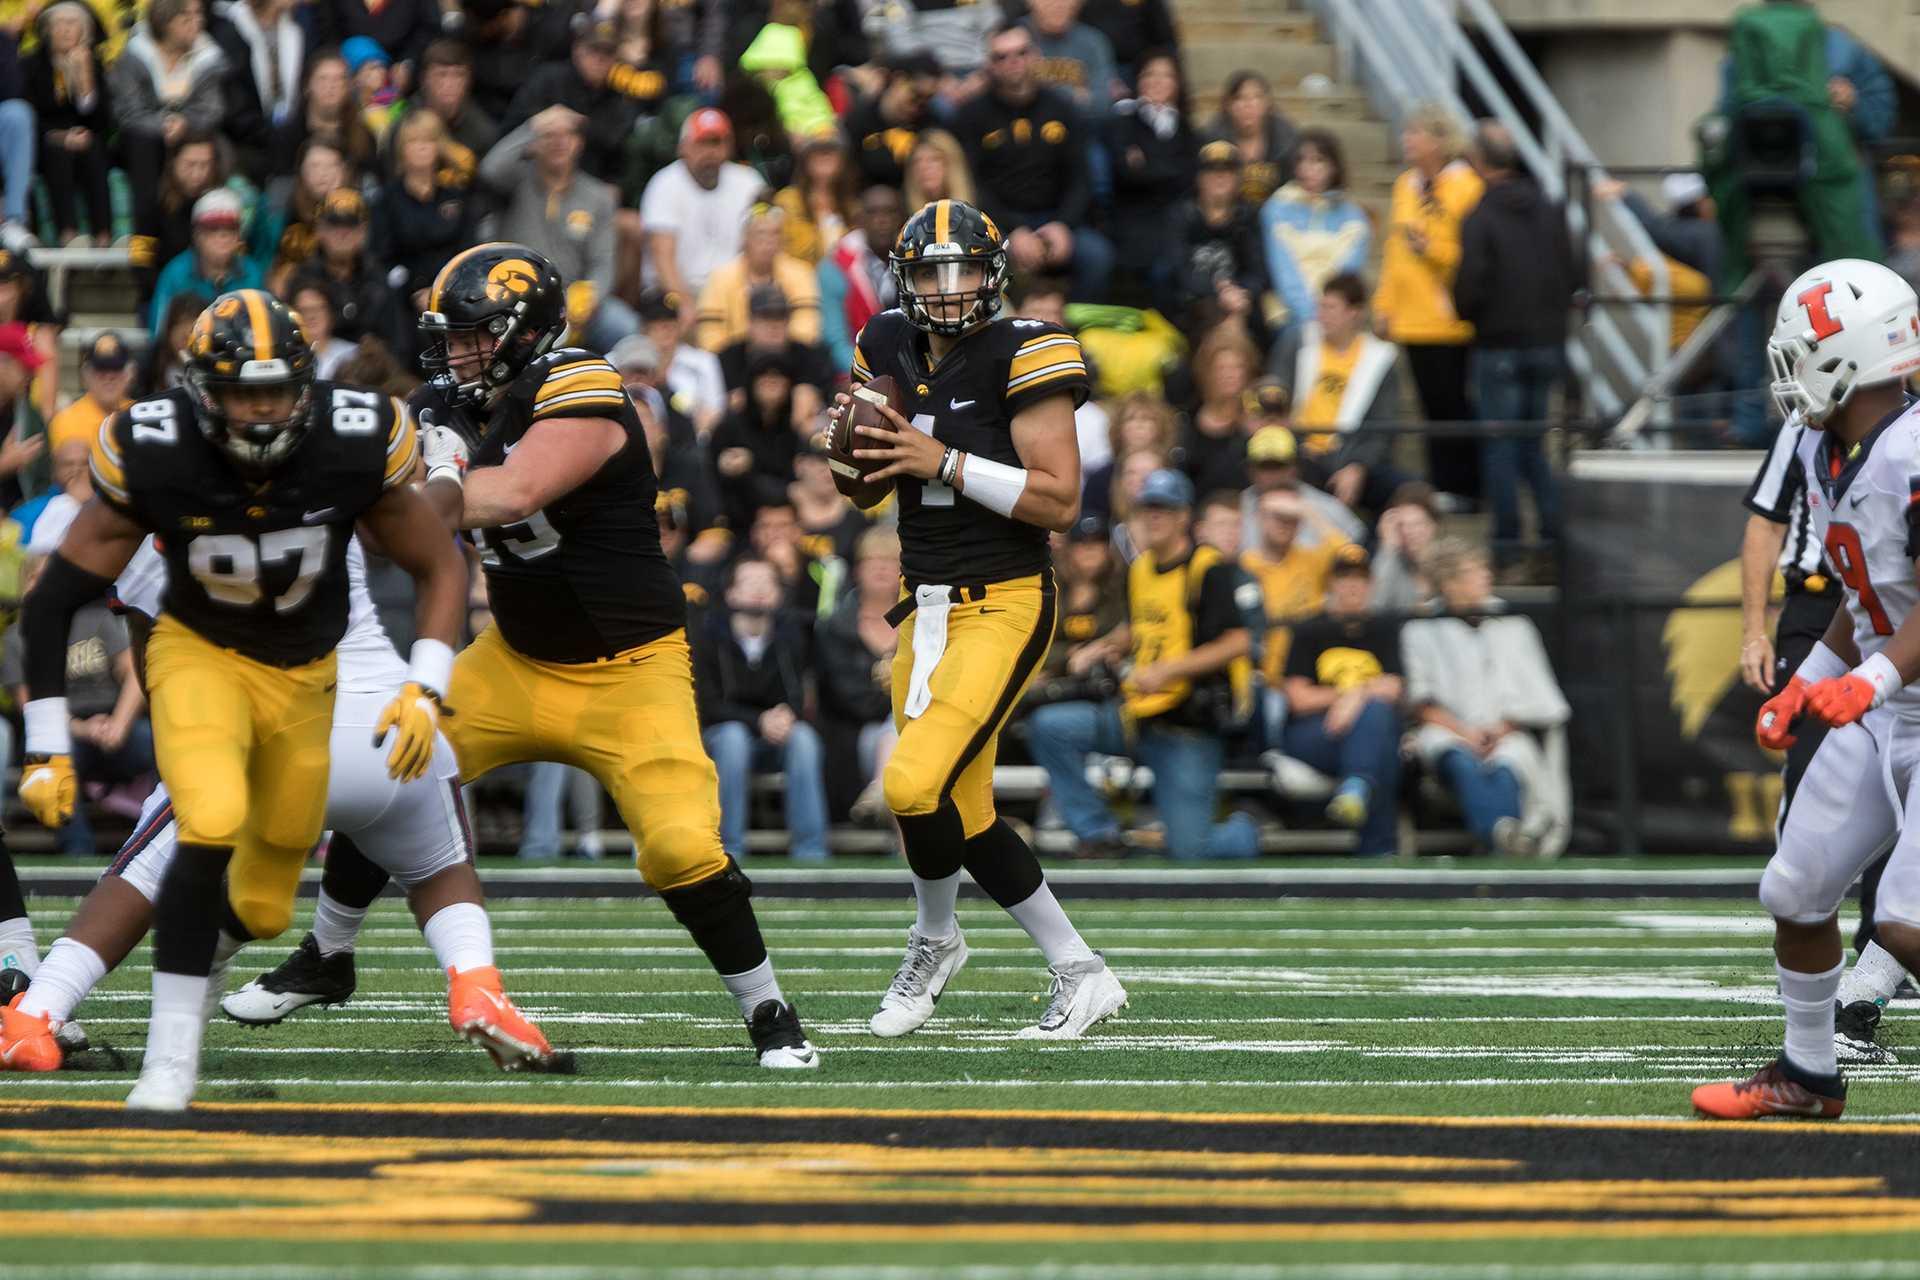 Iowa quarterback Nate Stanley drops back to pass during the Iowa/Illinois football game on Saturday, 7 Oct. 2017. Iowa won the game, 45-16. (David Harmantas/The Daily Iowan)